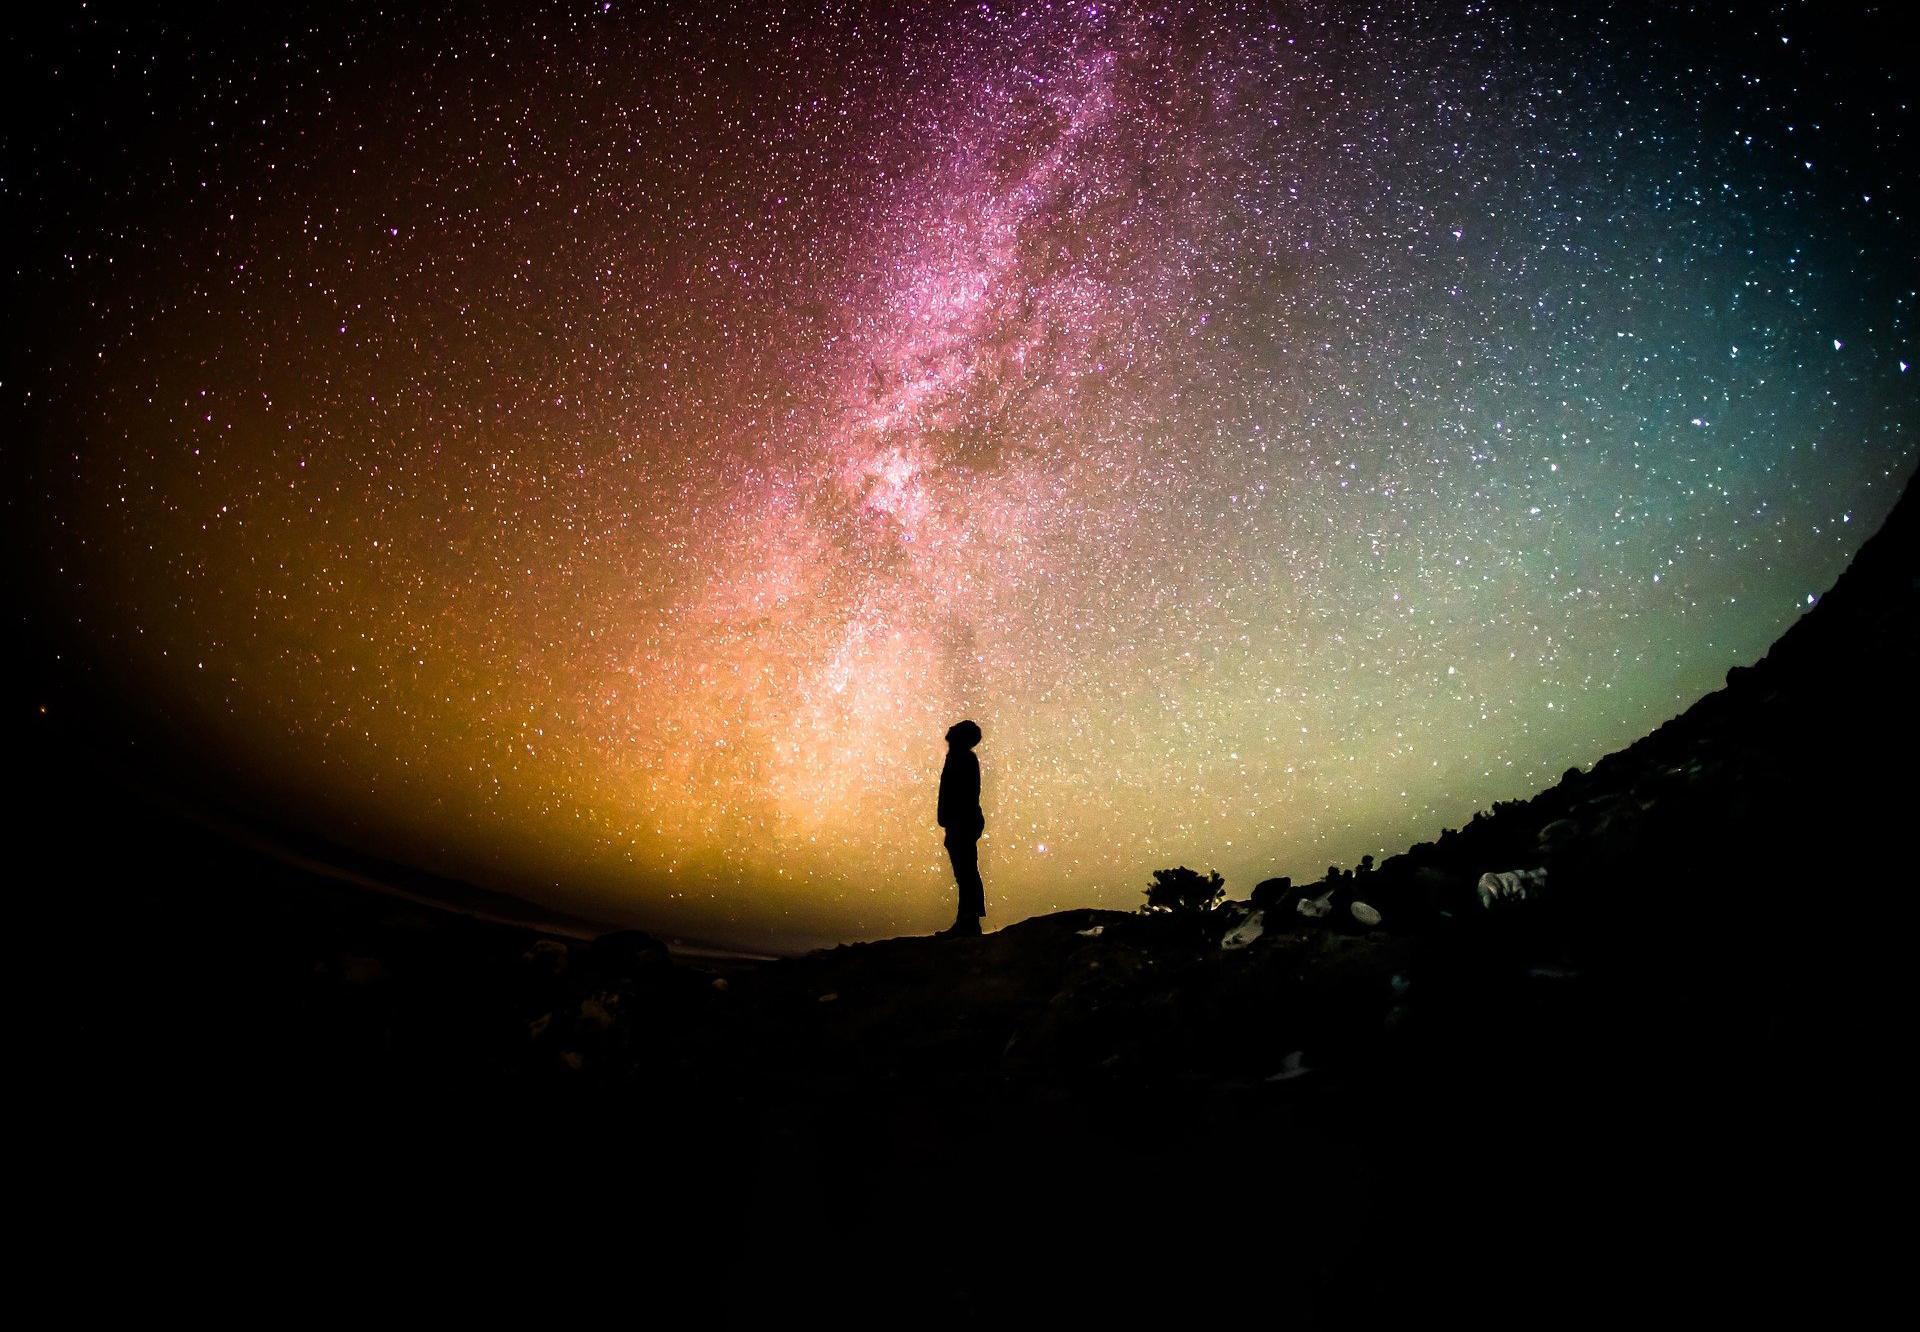 A lone figure looks up an a starry sky.